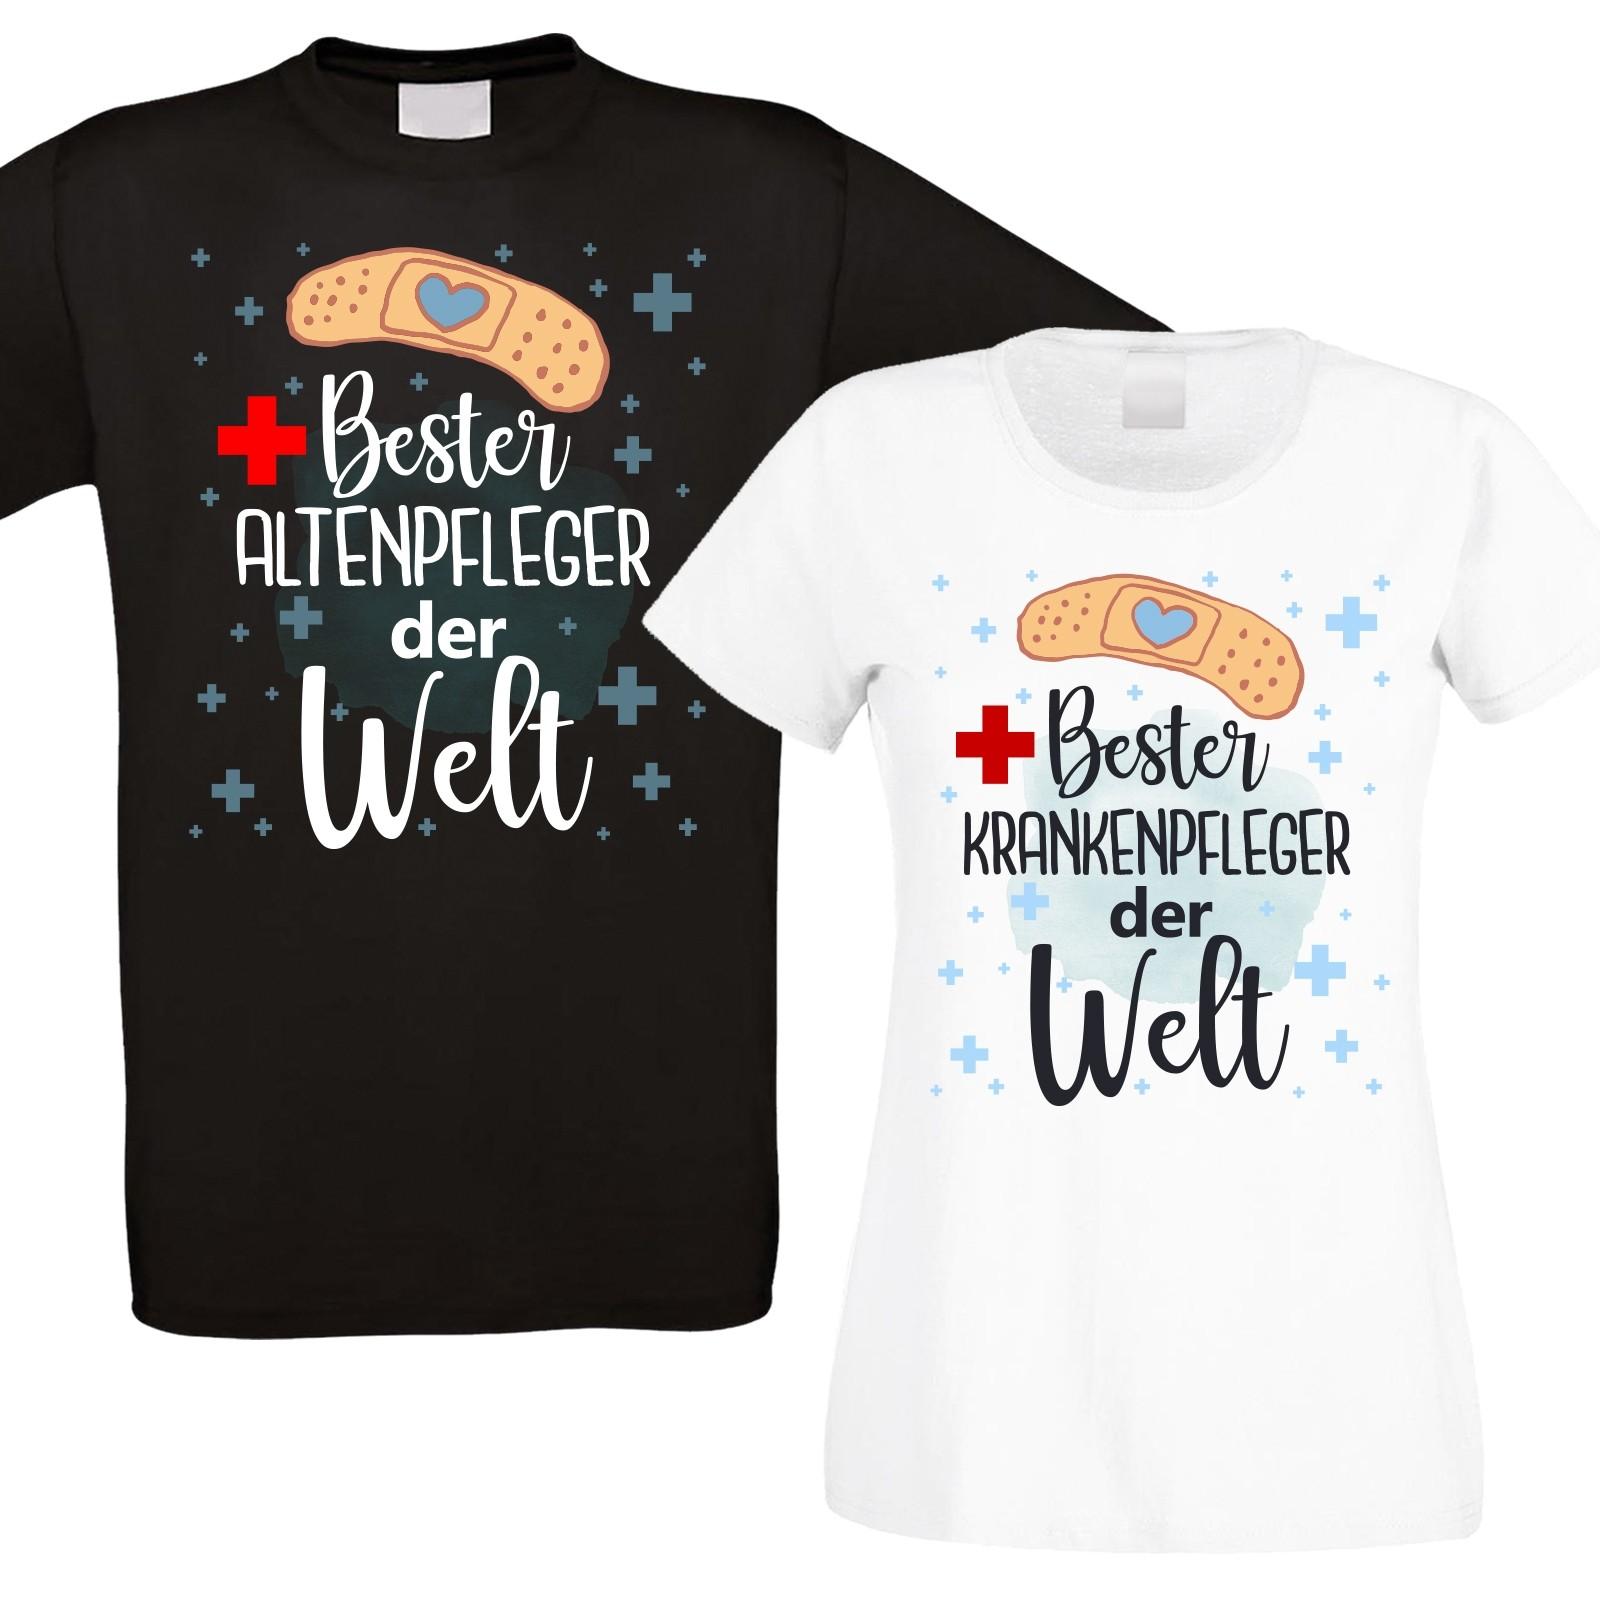 Funshirt oder Tanktop: Bester Krankenpfleger / Altenpfleger der Welt.